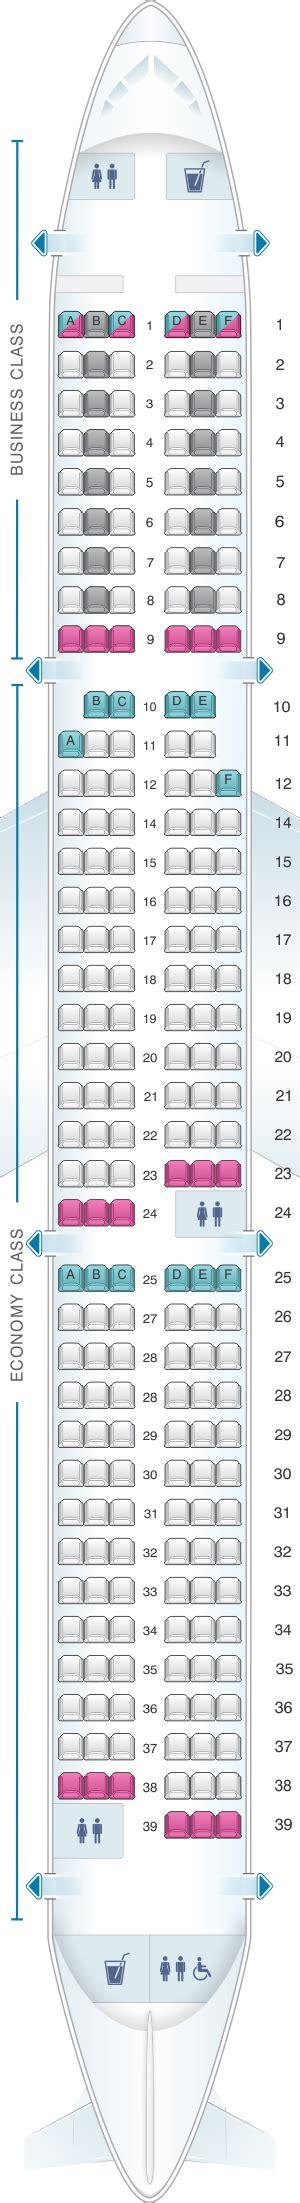 siege swiss seat map swiss airbus a321 100 200 seatmaestro